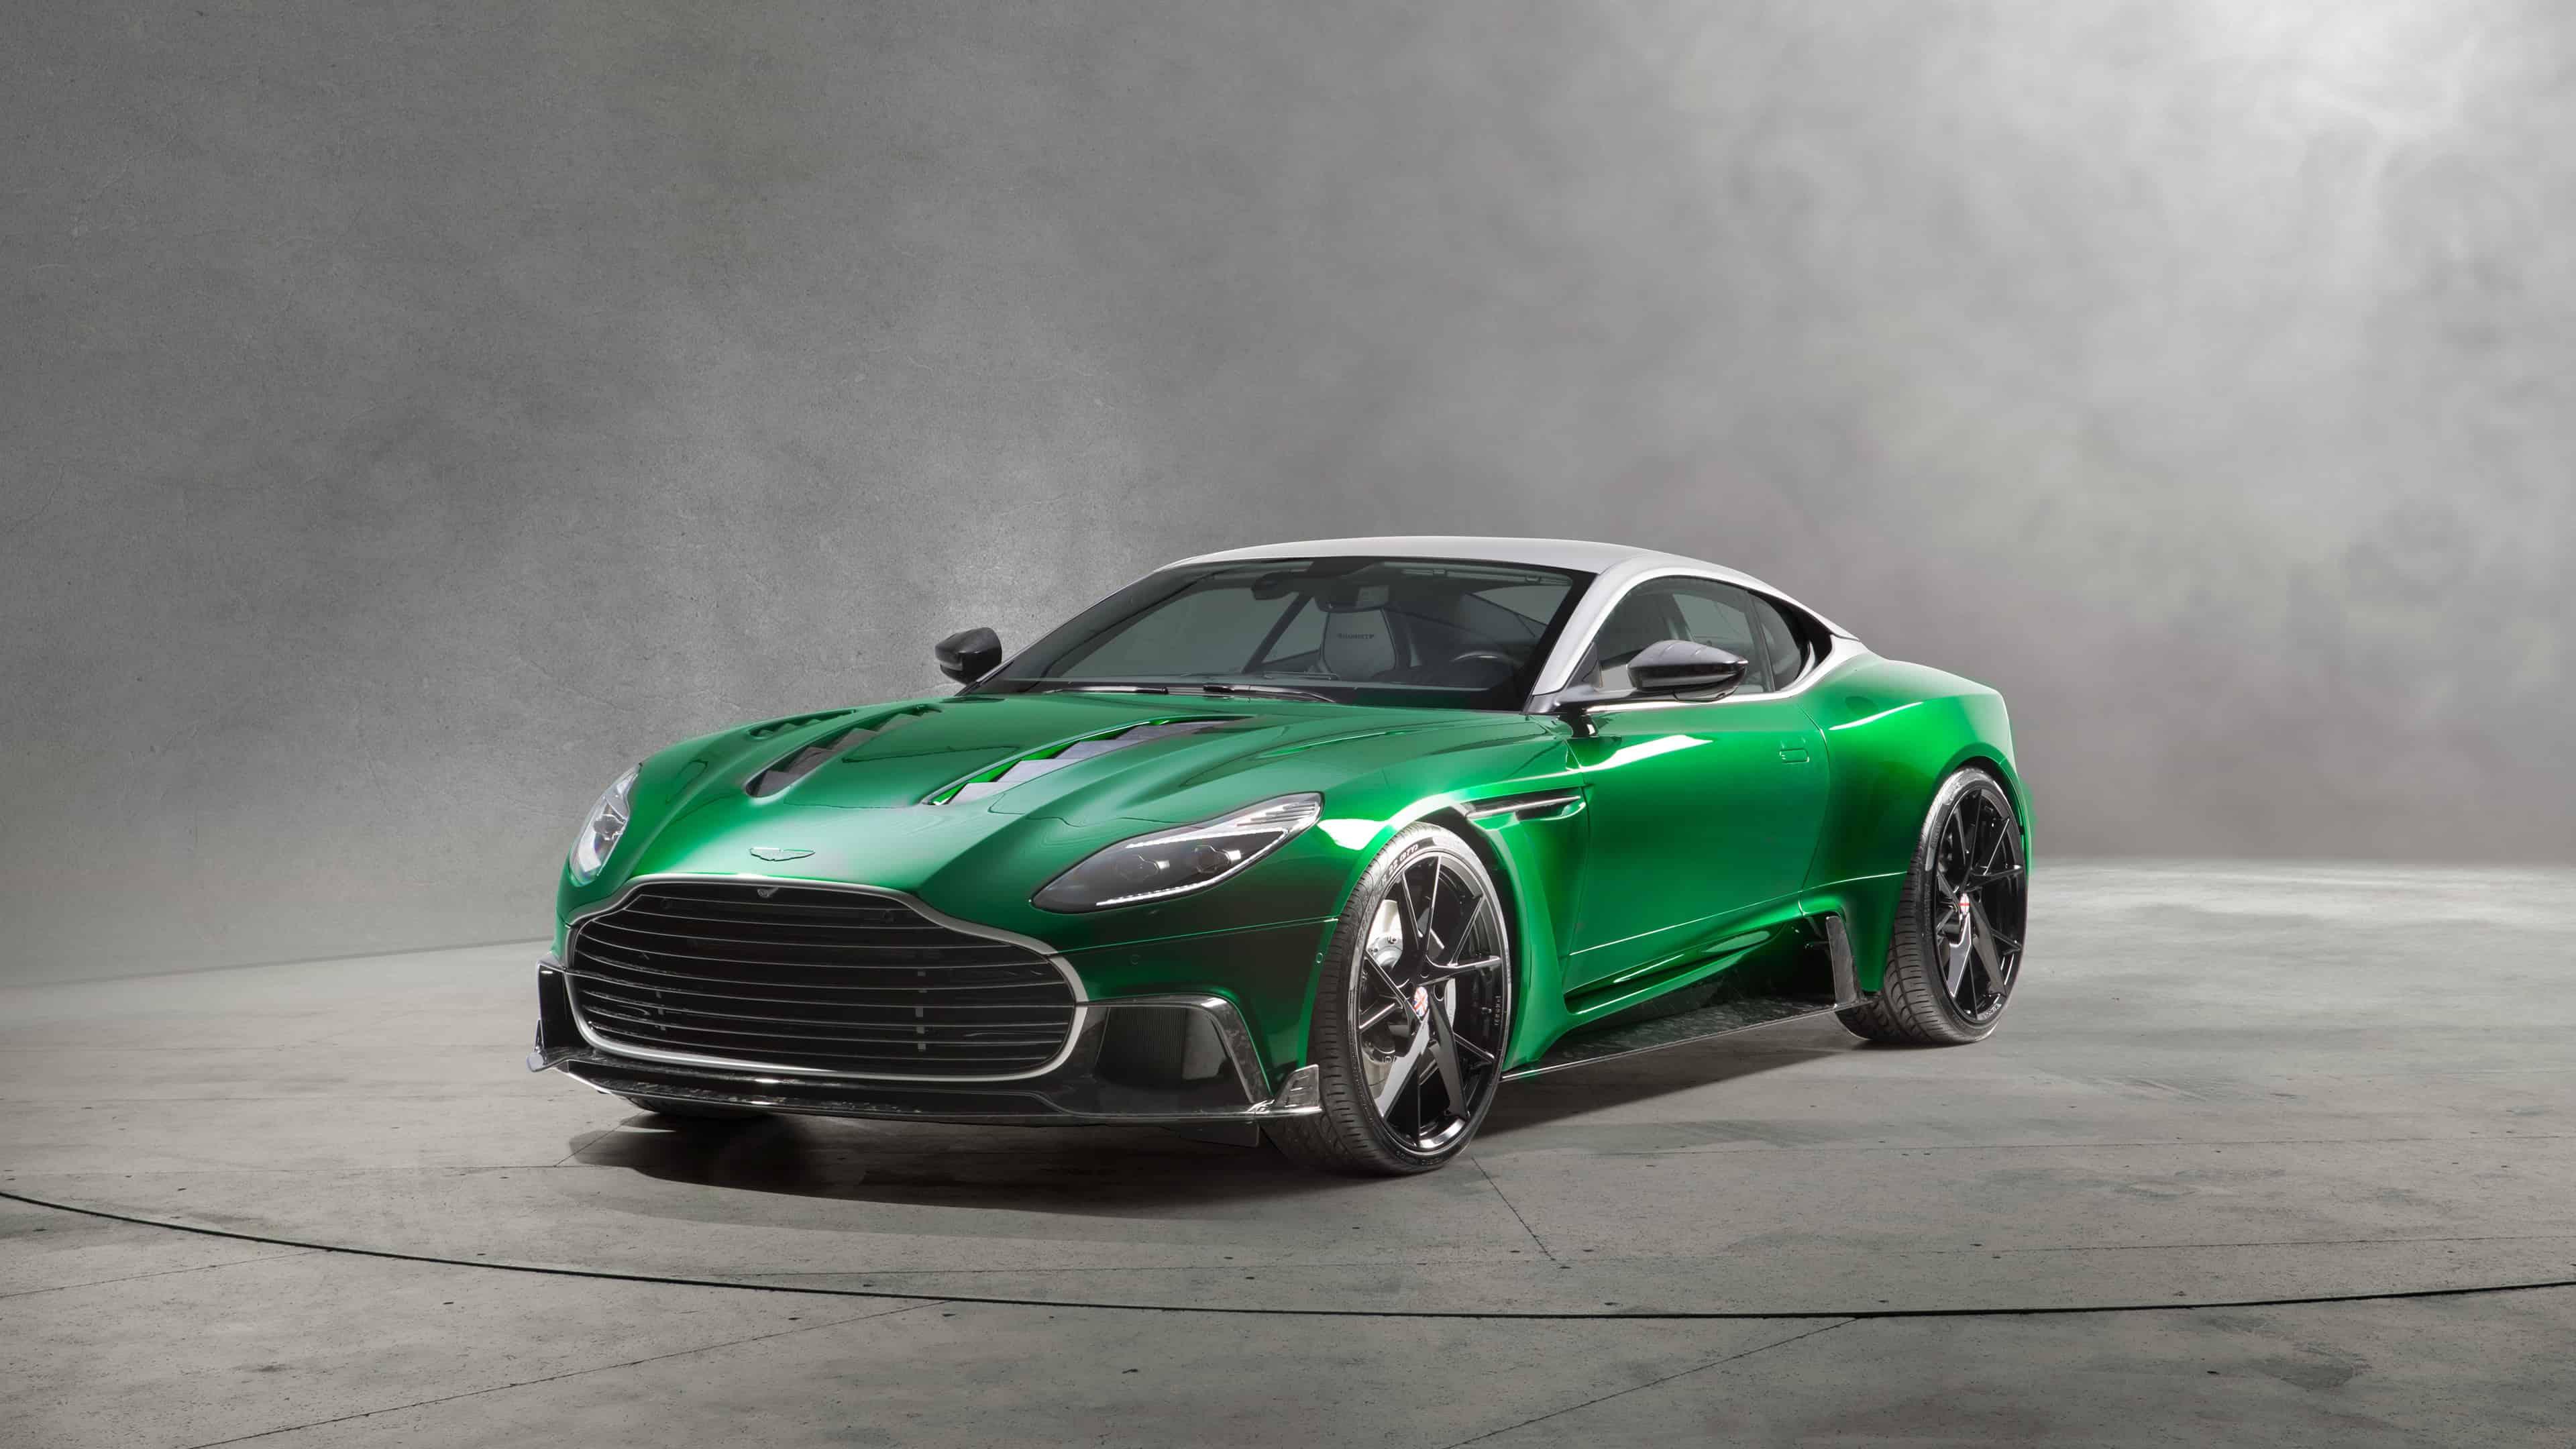 Aston Martin DB11 Cyrus UHD 4K Wallpaper Pixelz 3840x2160